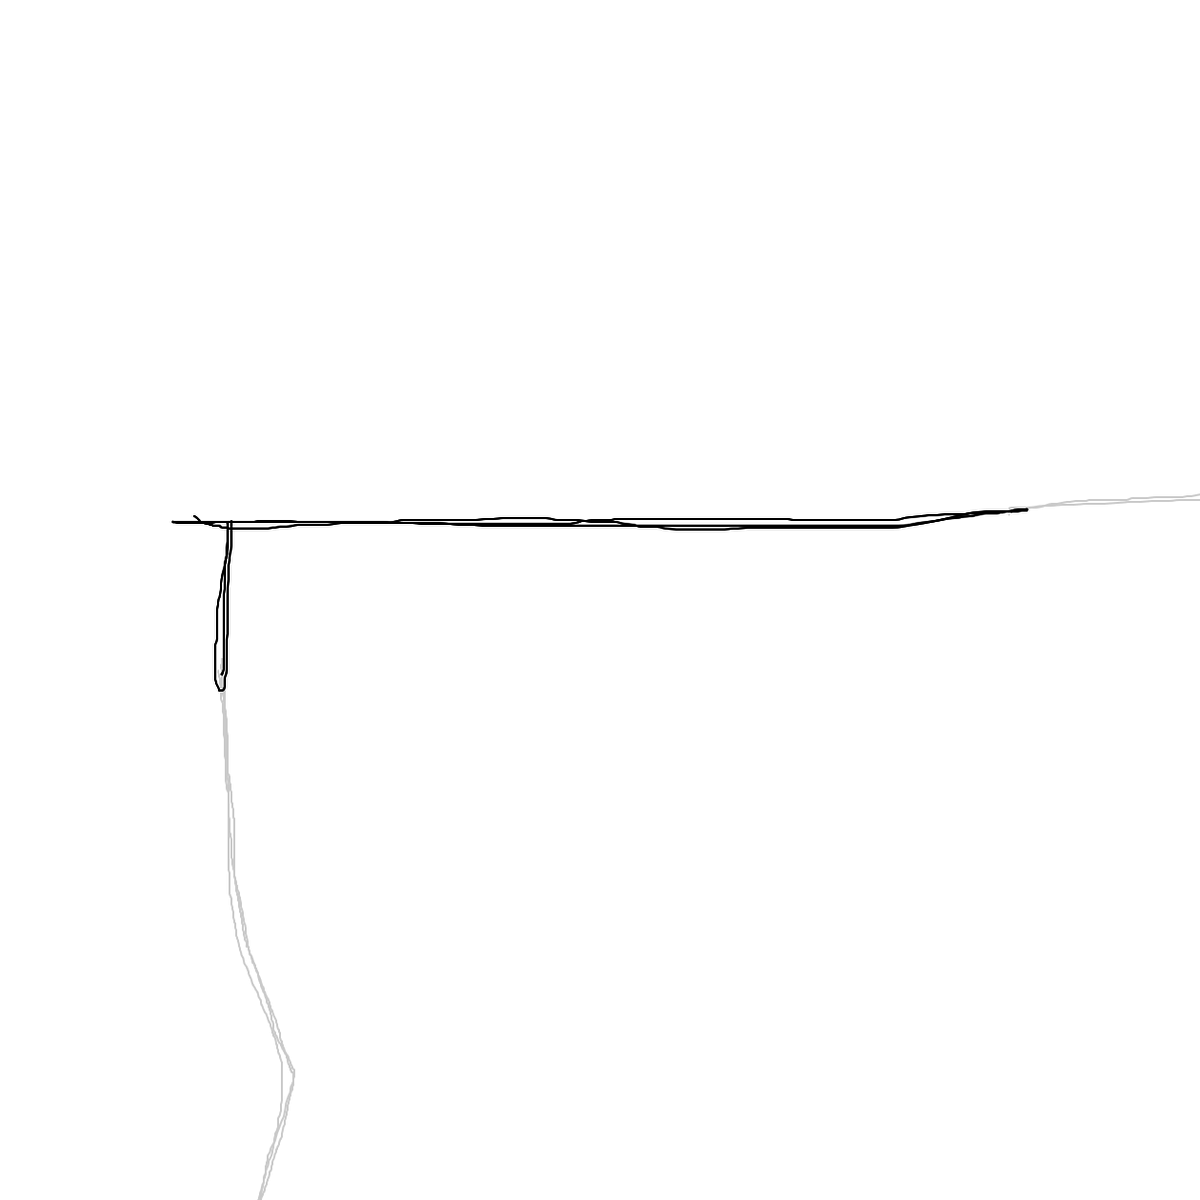 BAAAM drawing#10738 lat:51.0363807678222660lng: -114.0524978637695300